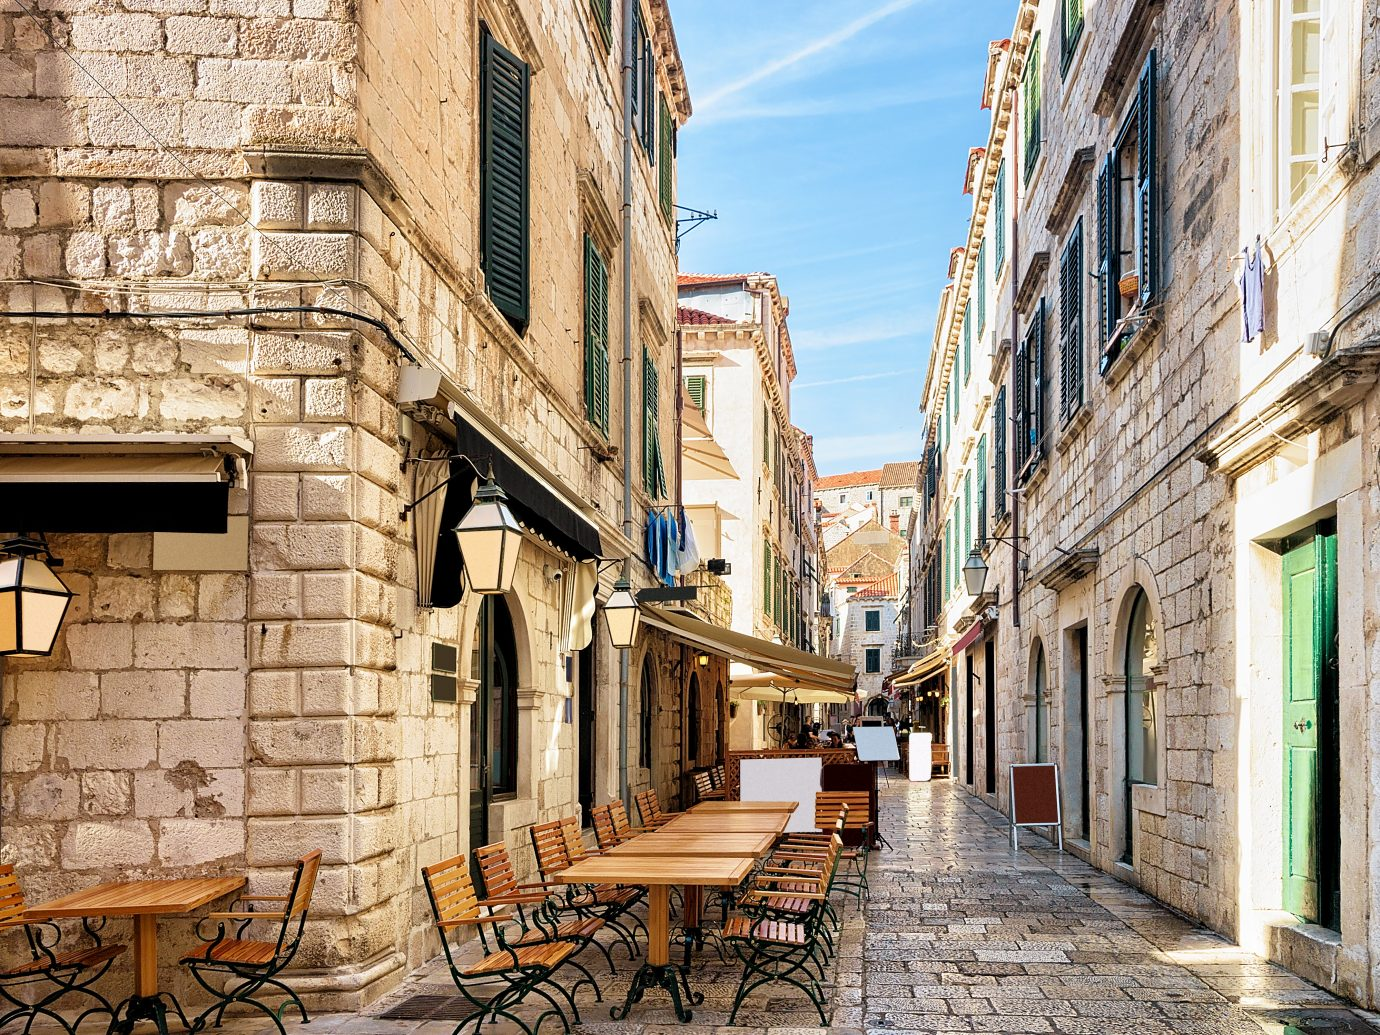 Open Street terrace restaurant in the Old town of Dubrovnik, Croatia